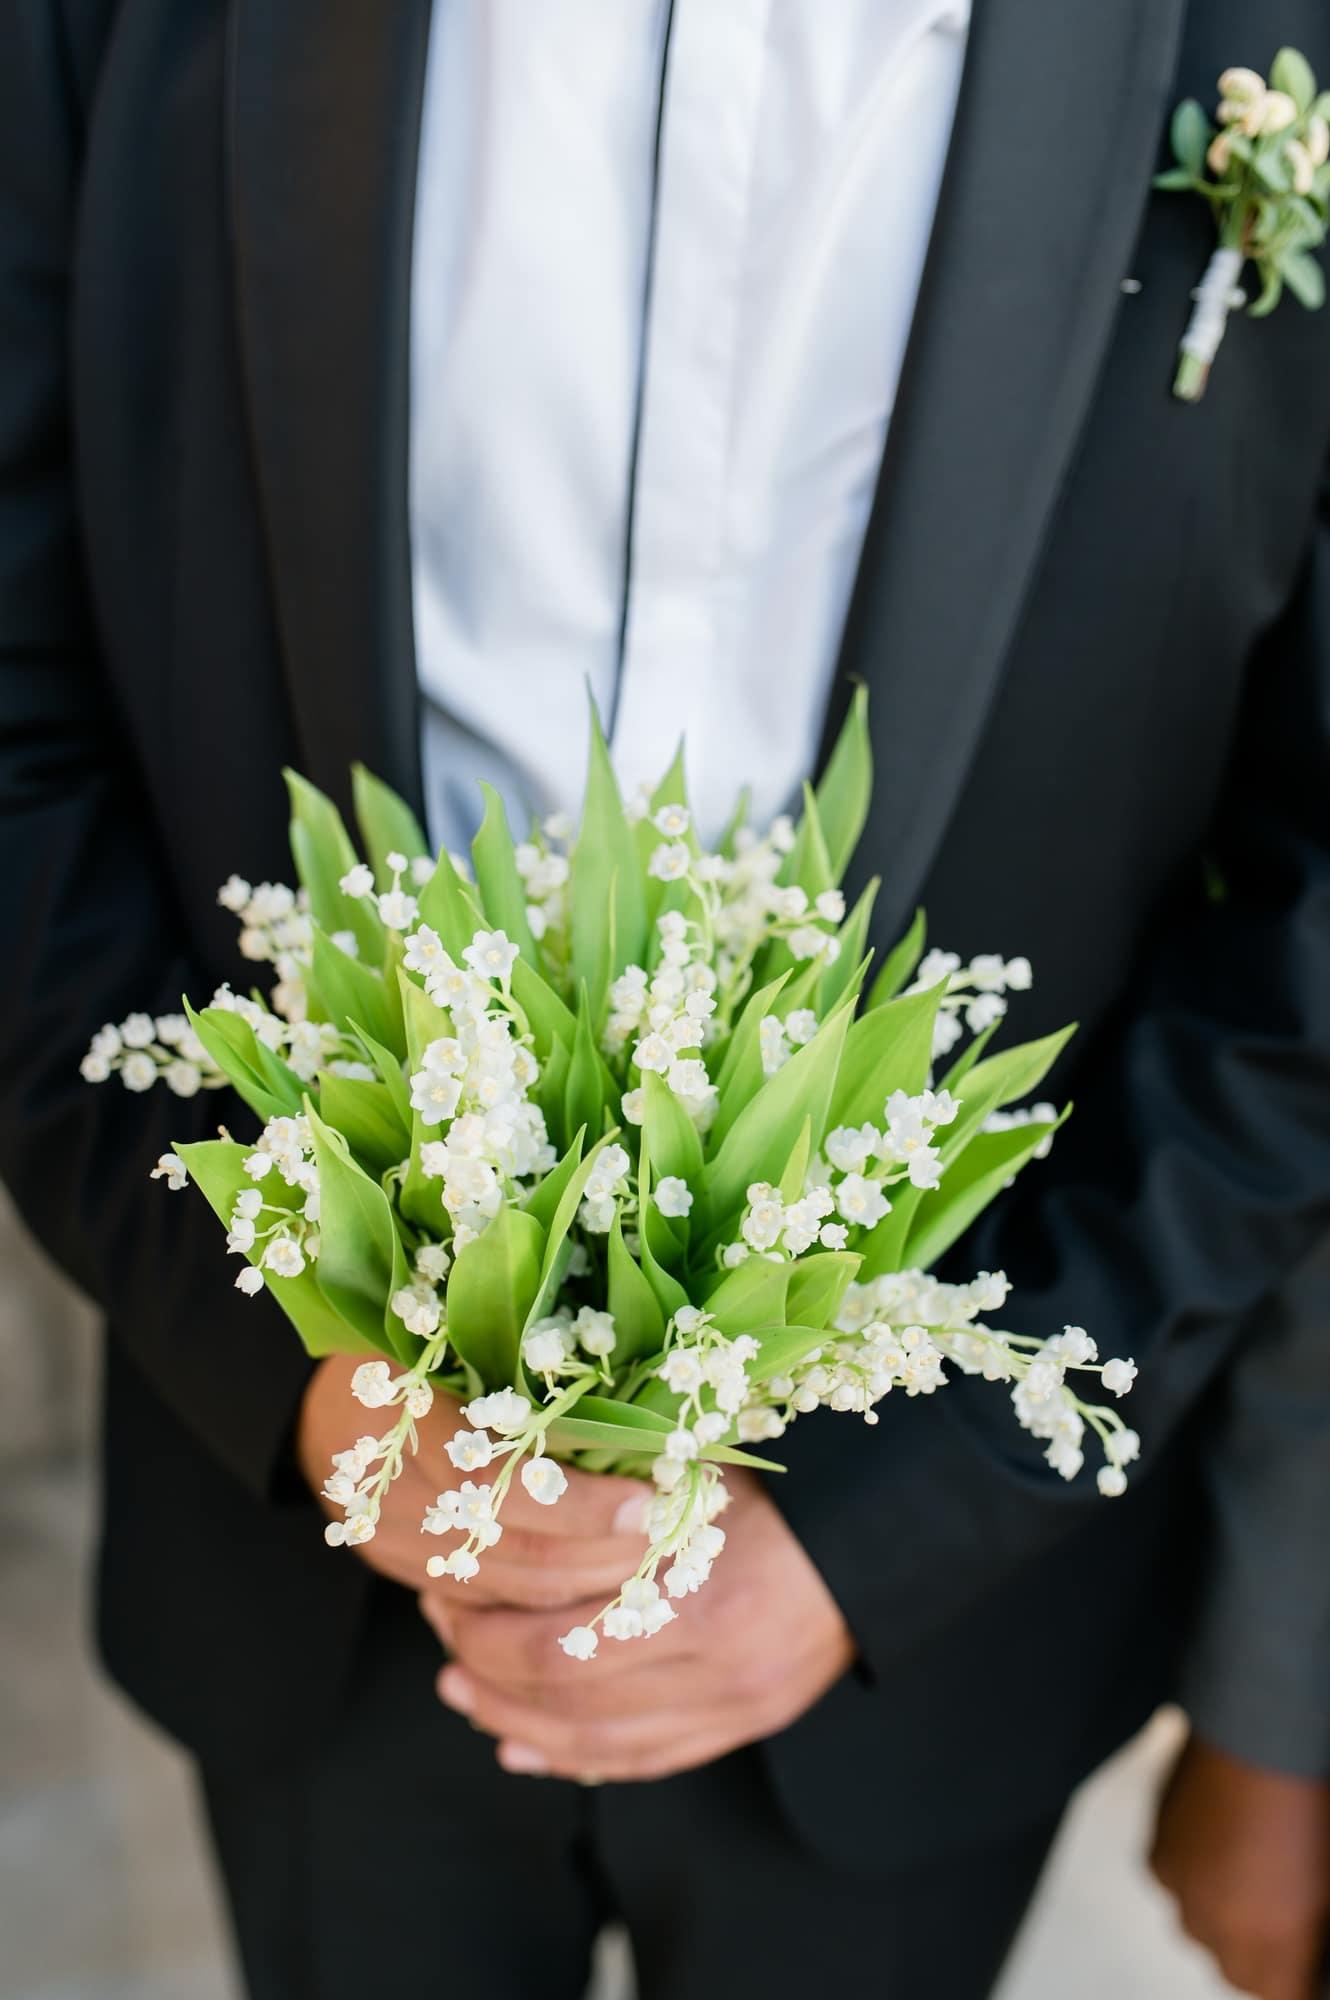 Posy νυφική ανθοδέσμη  με lily of the valley